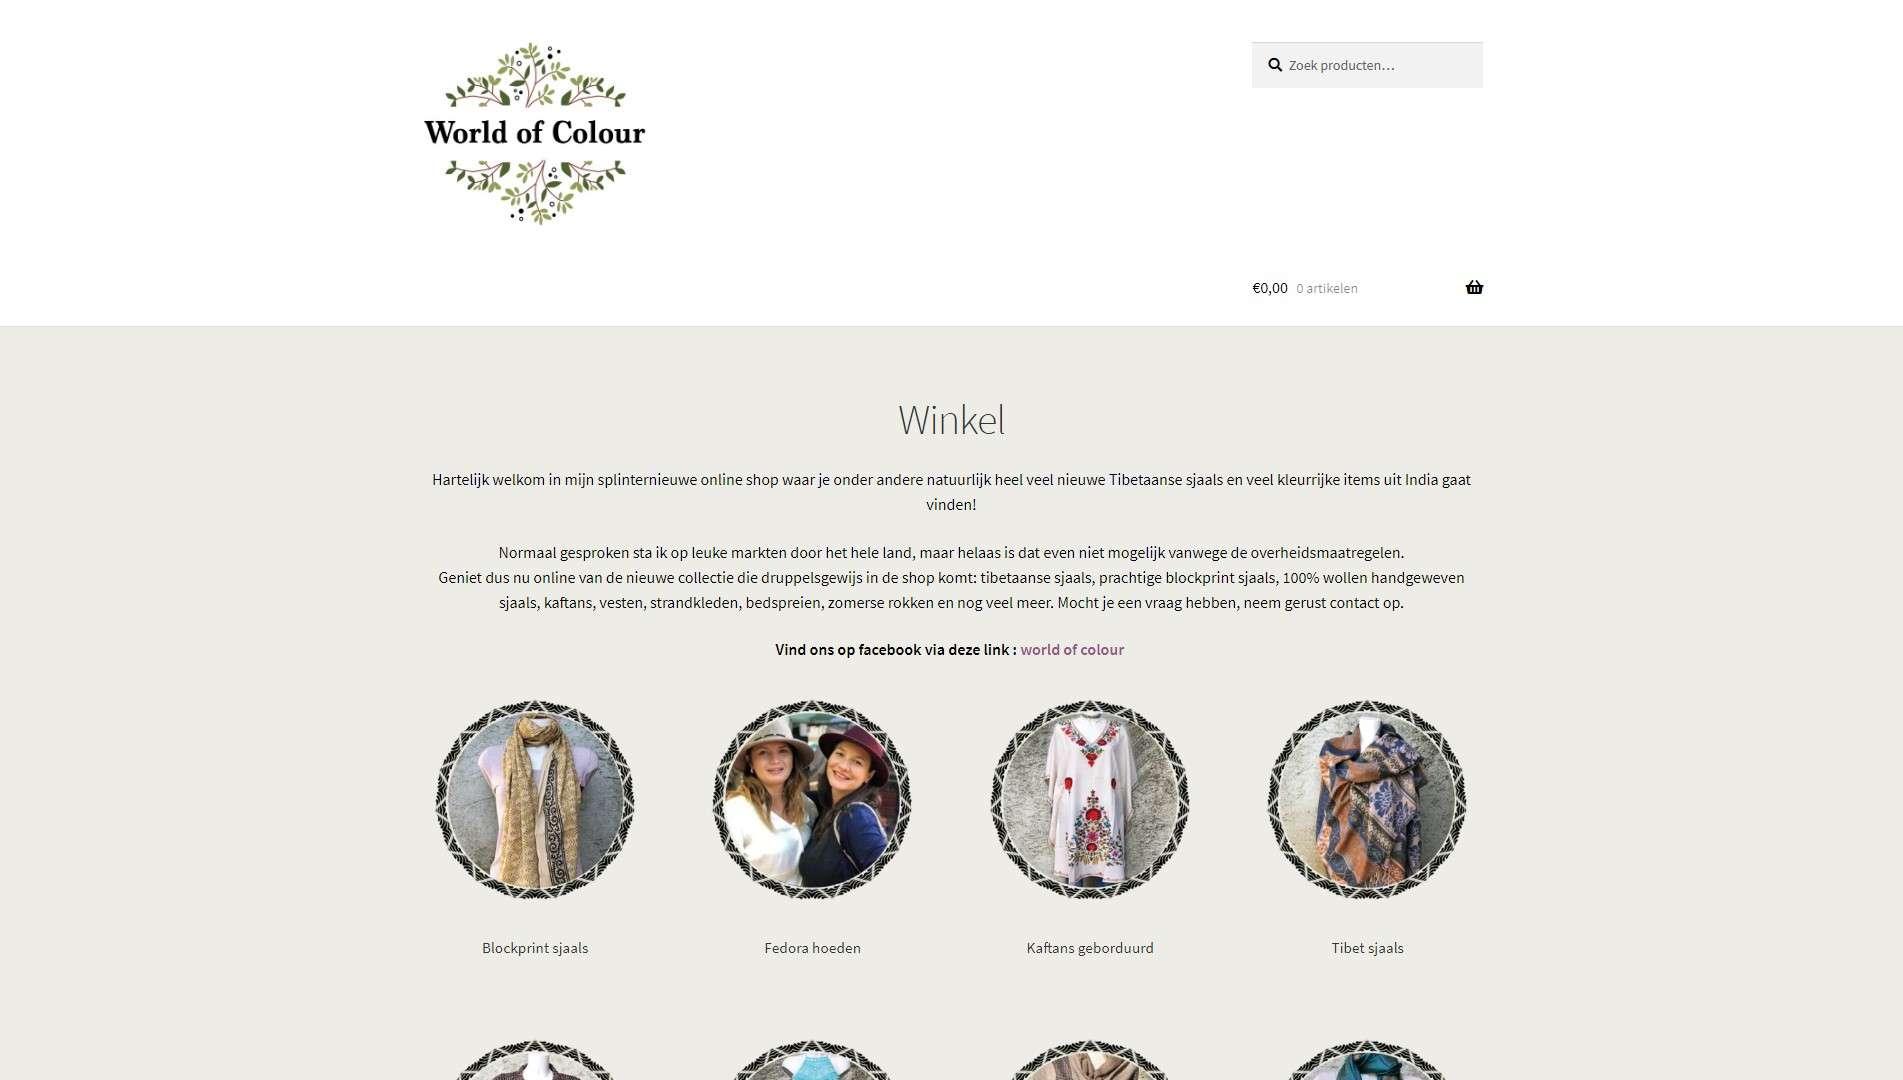 Worldofcolour.nl Tibet shawls and fashion. Referenties onlinewebshop.eu